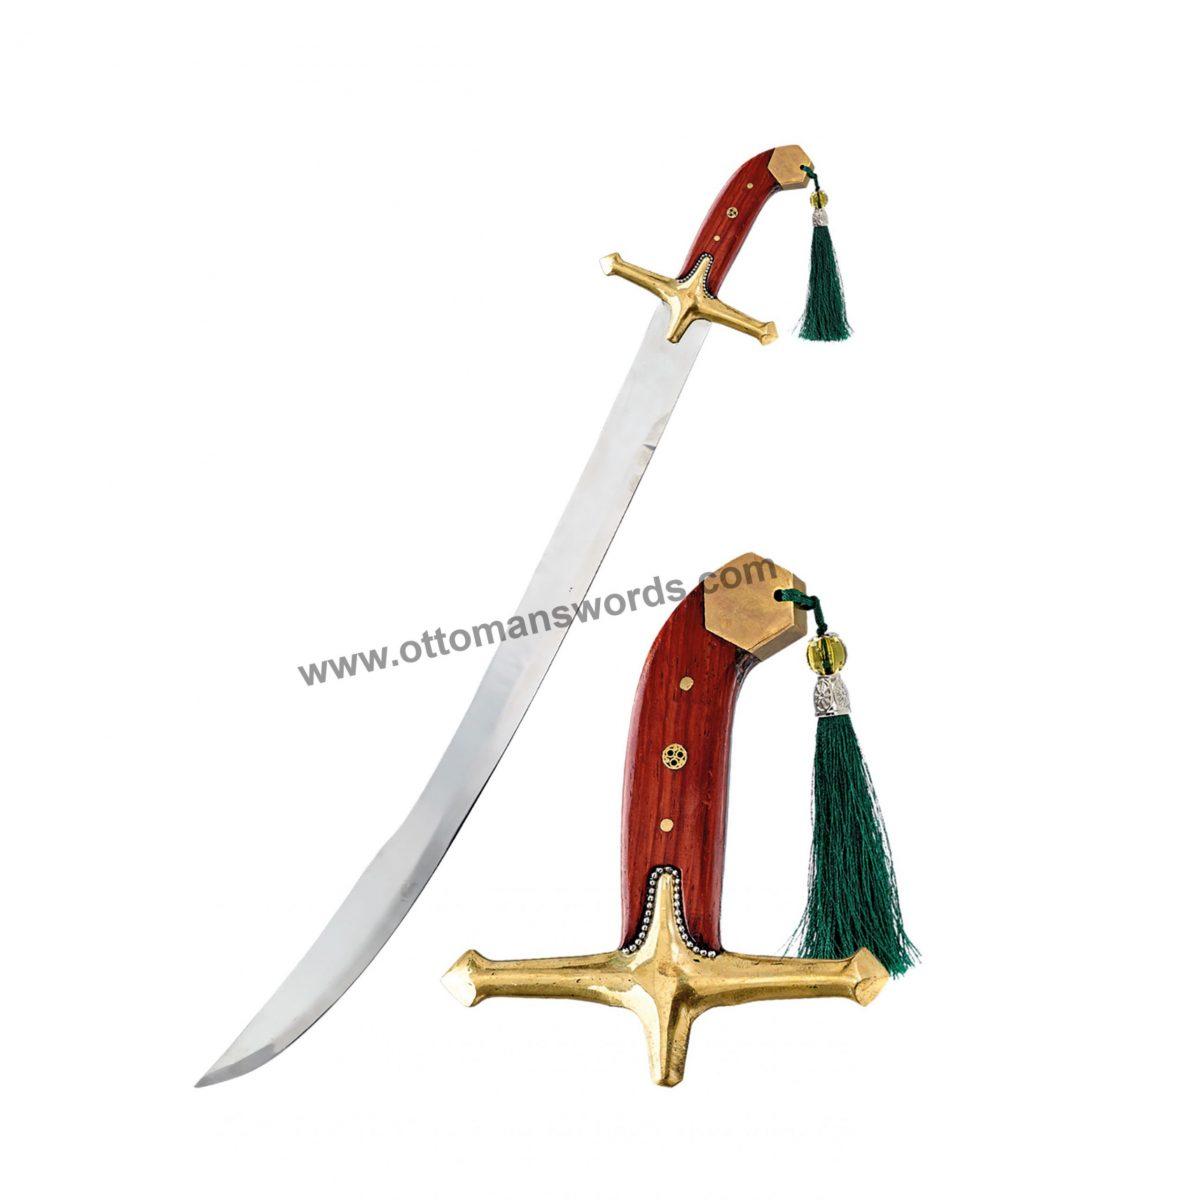 Sultan Alparslan ottoman sword